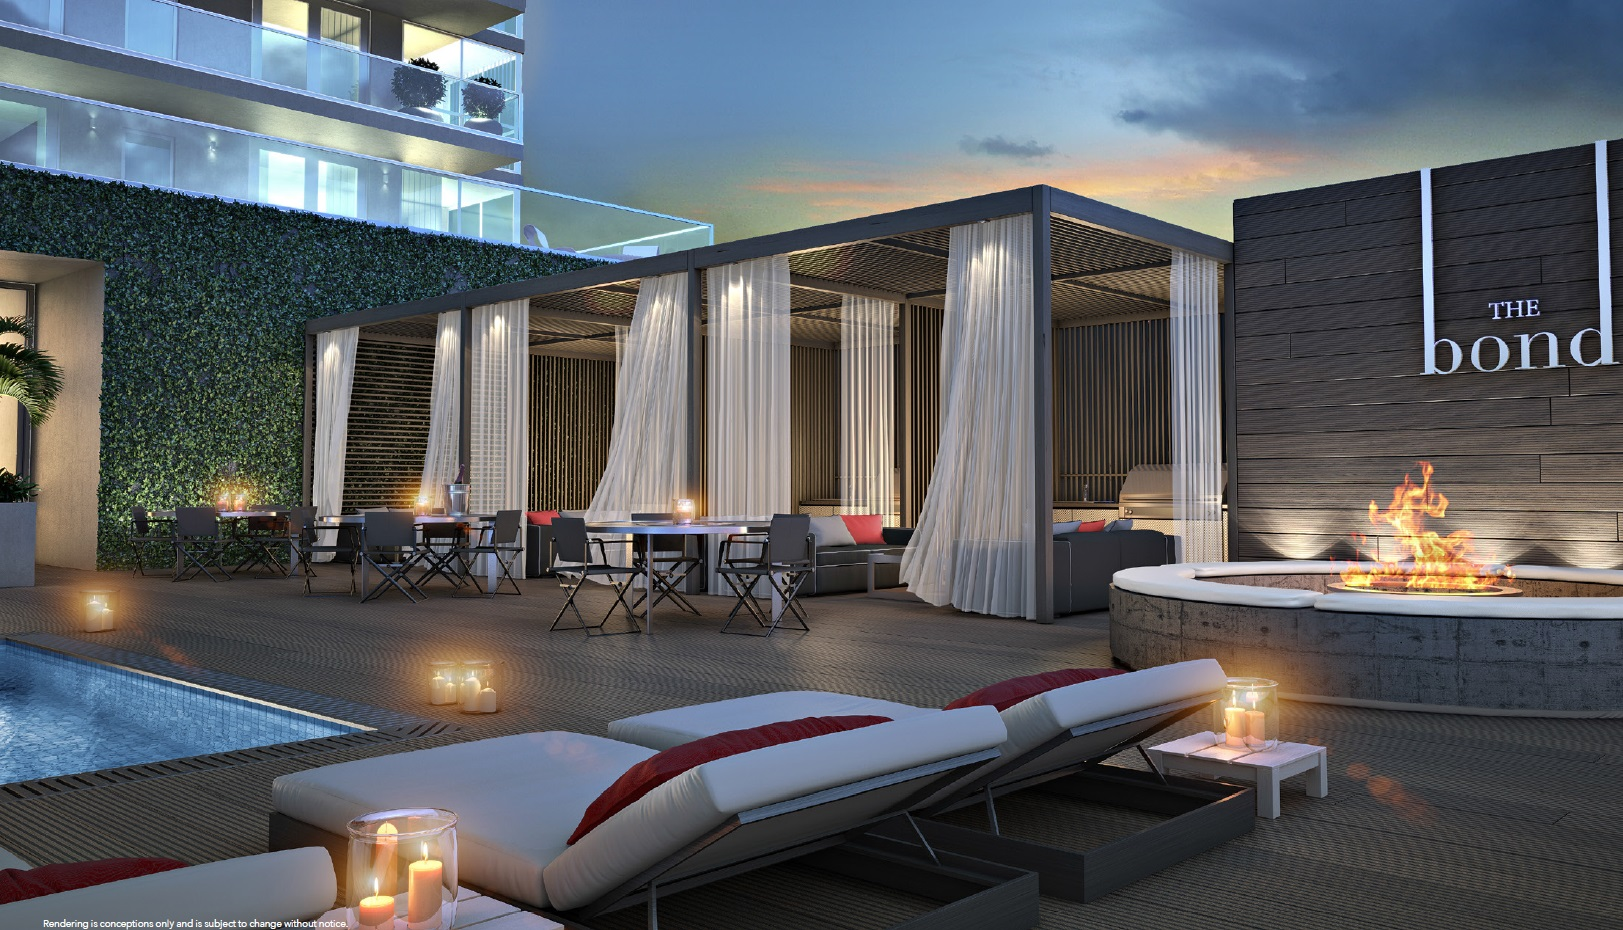 The-Bond-On-Brickell-pool-deck-cabanas-rendering.jpg